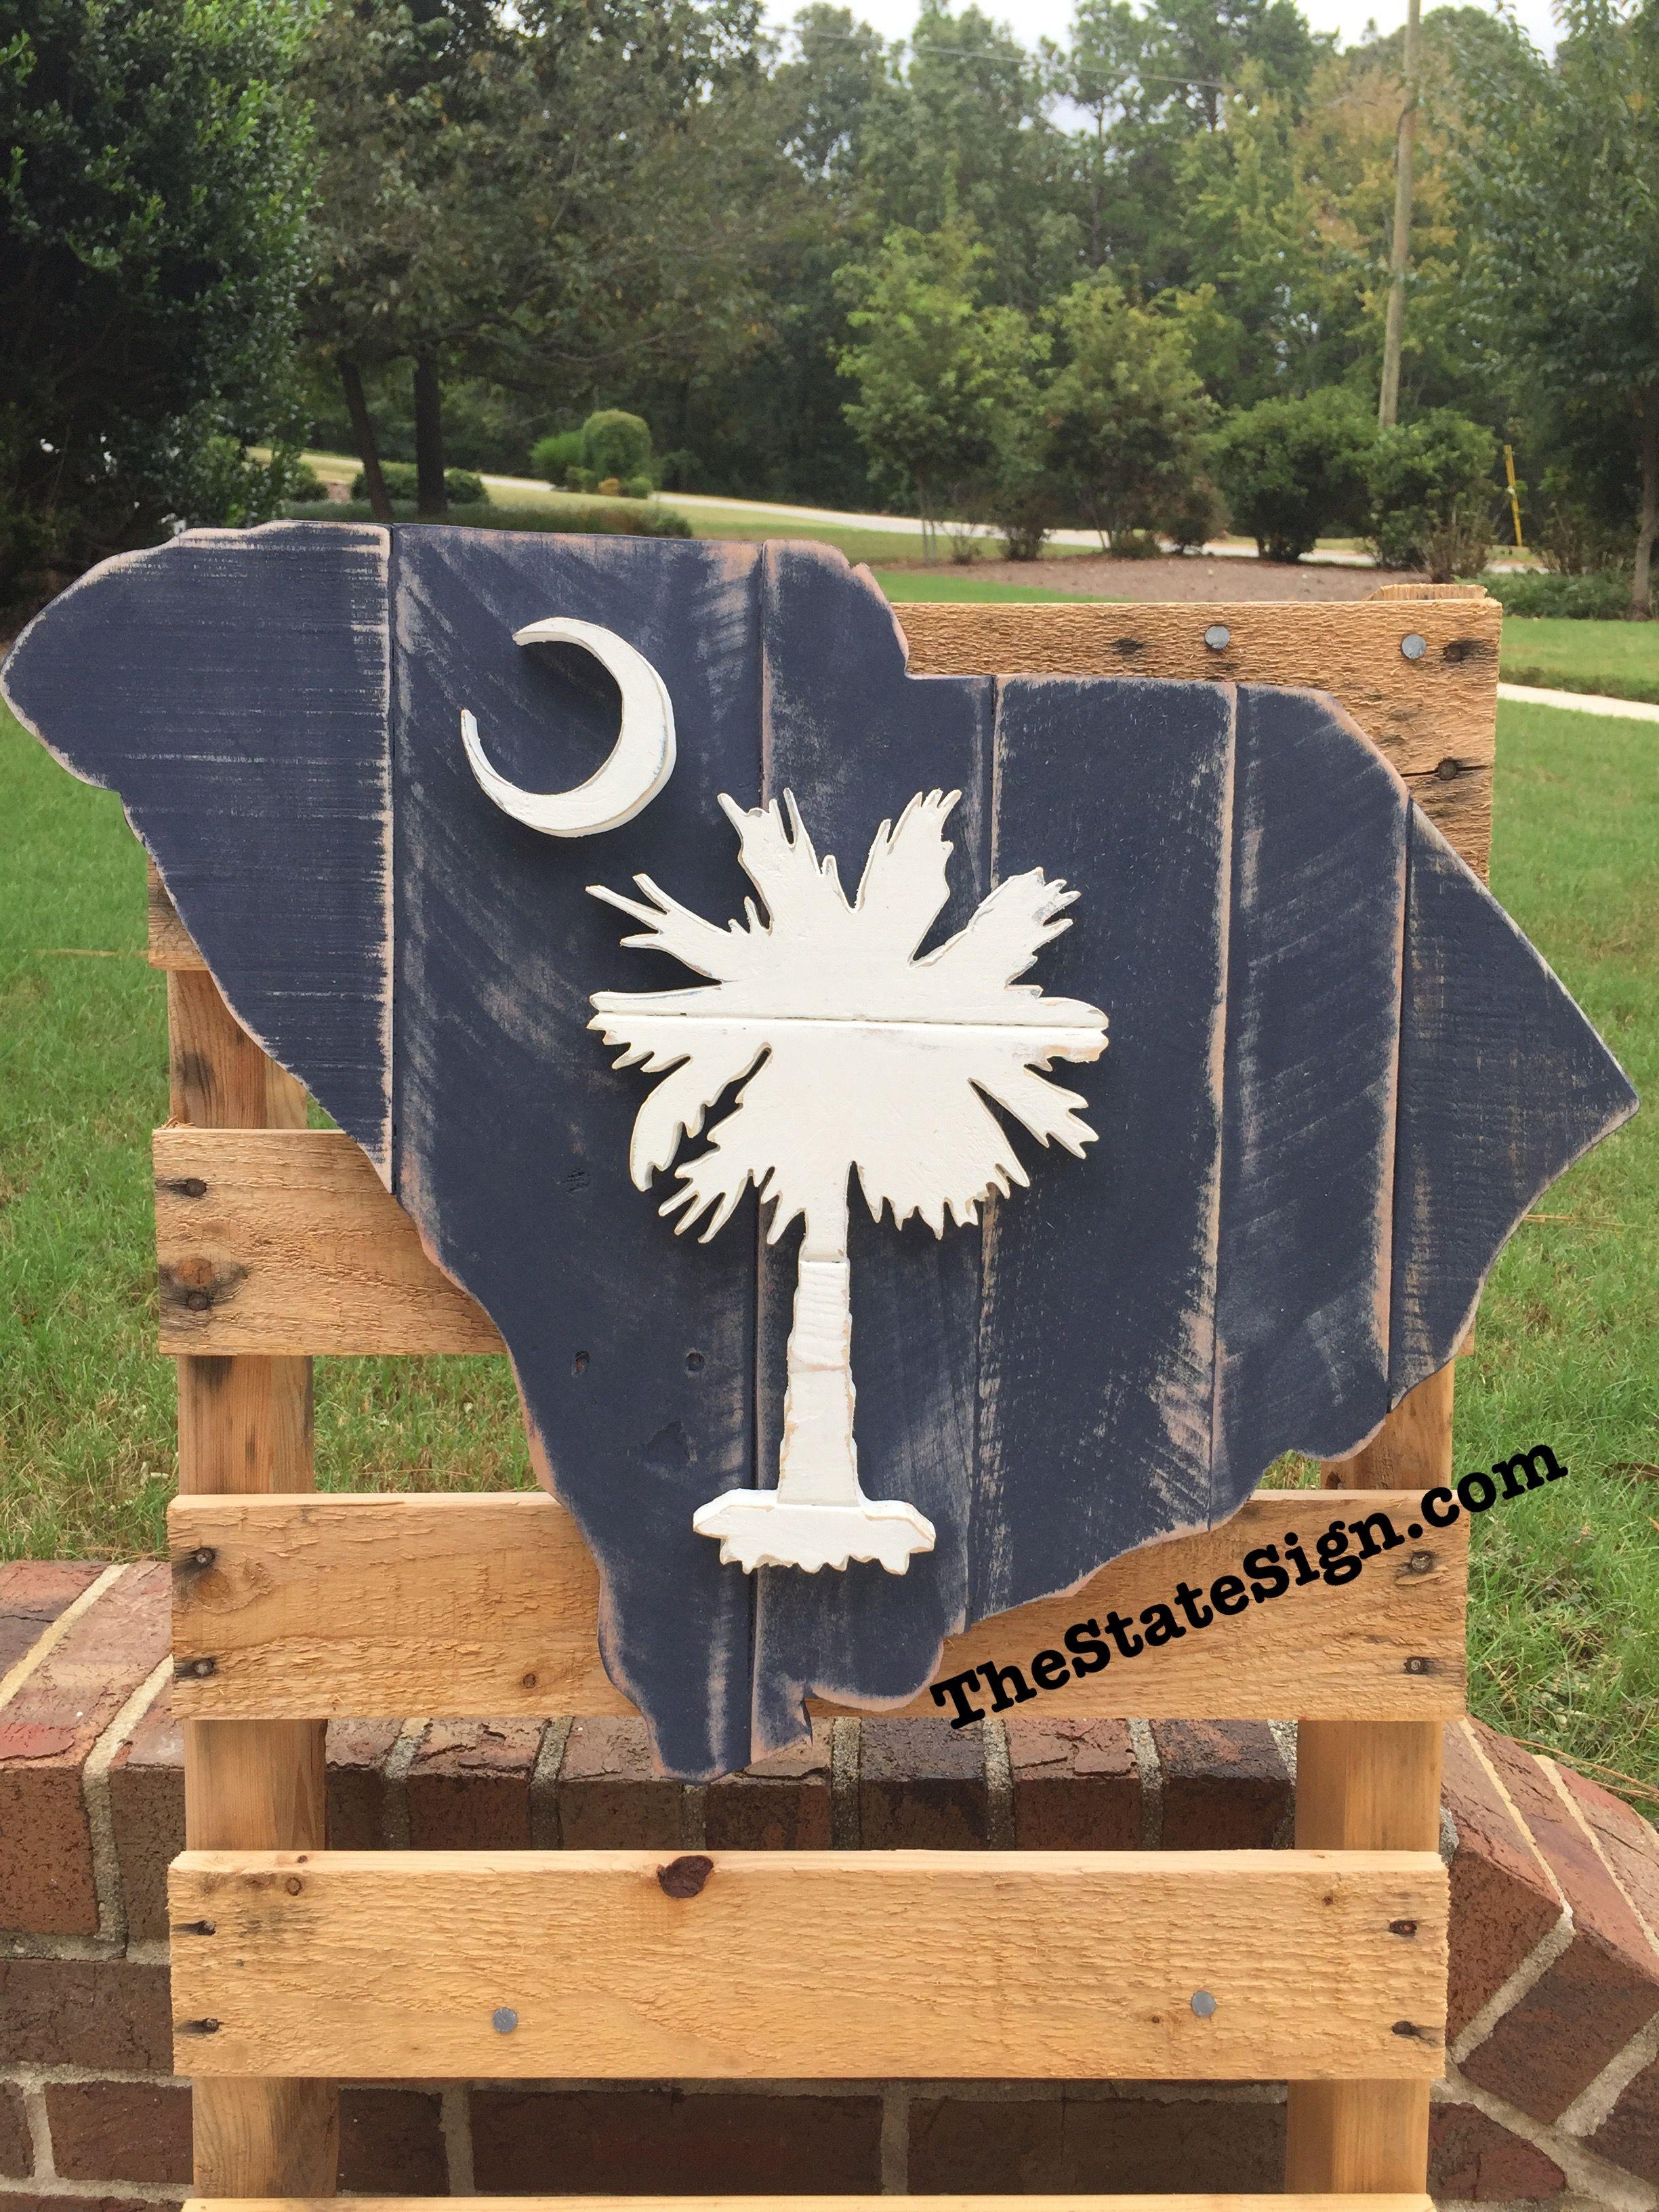 Sc Flag Tattoos: South Carolina (SC) State Flag Design Wooden Pallet State